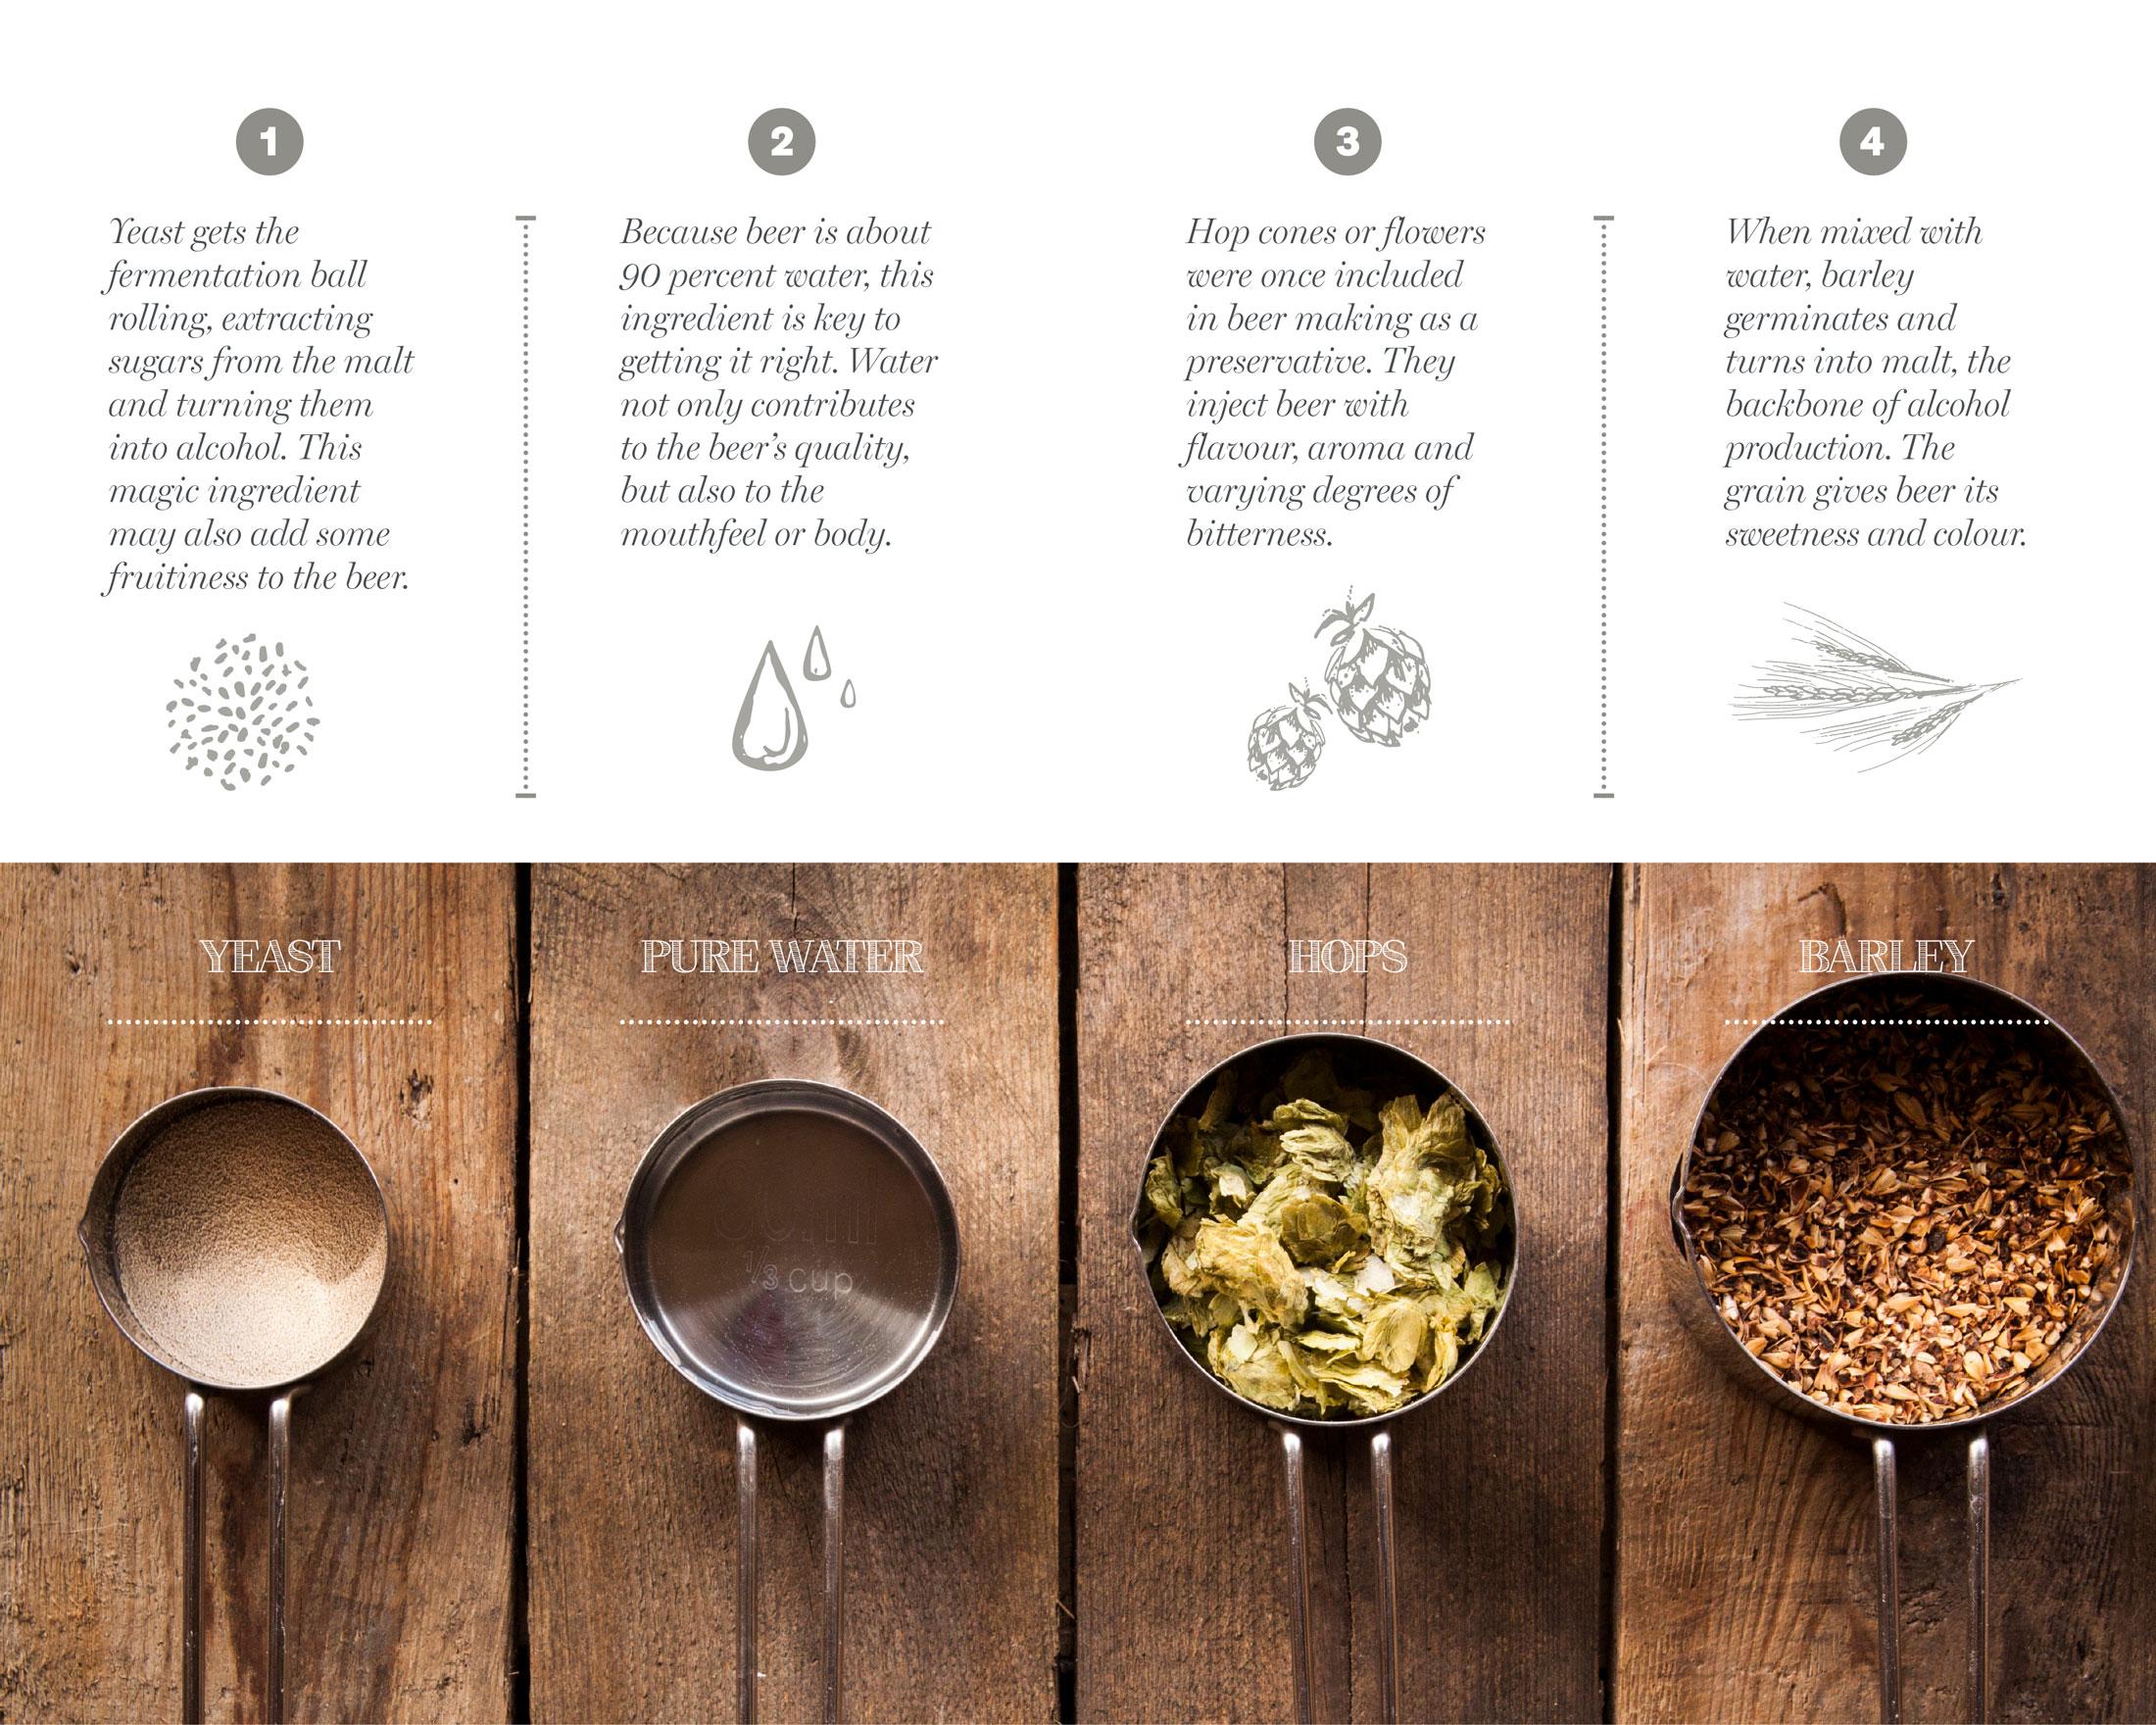 lcbo-beer-craft-beer-guide-inside-spread-sputnik-design-partners-toronto.jpg